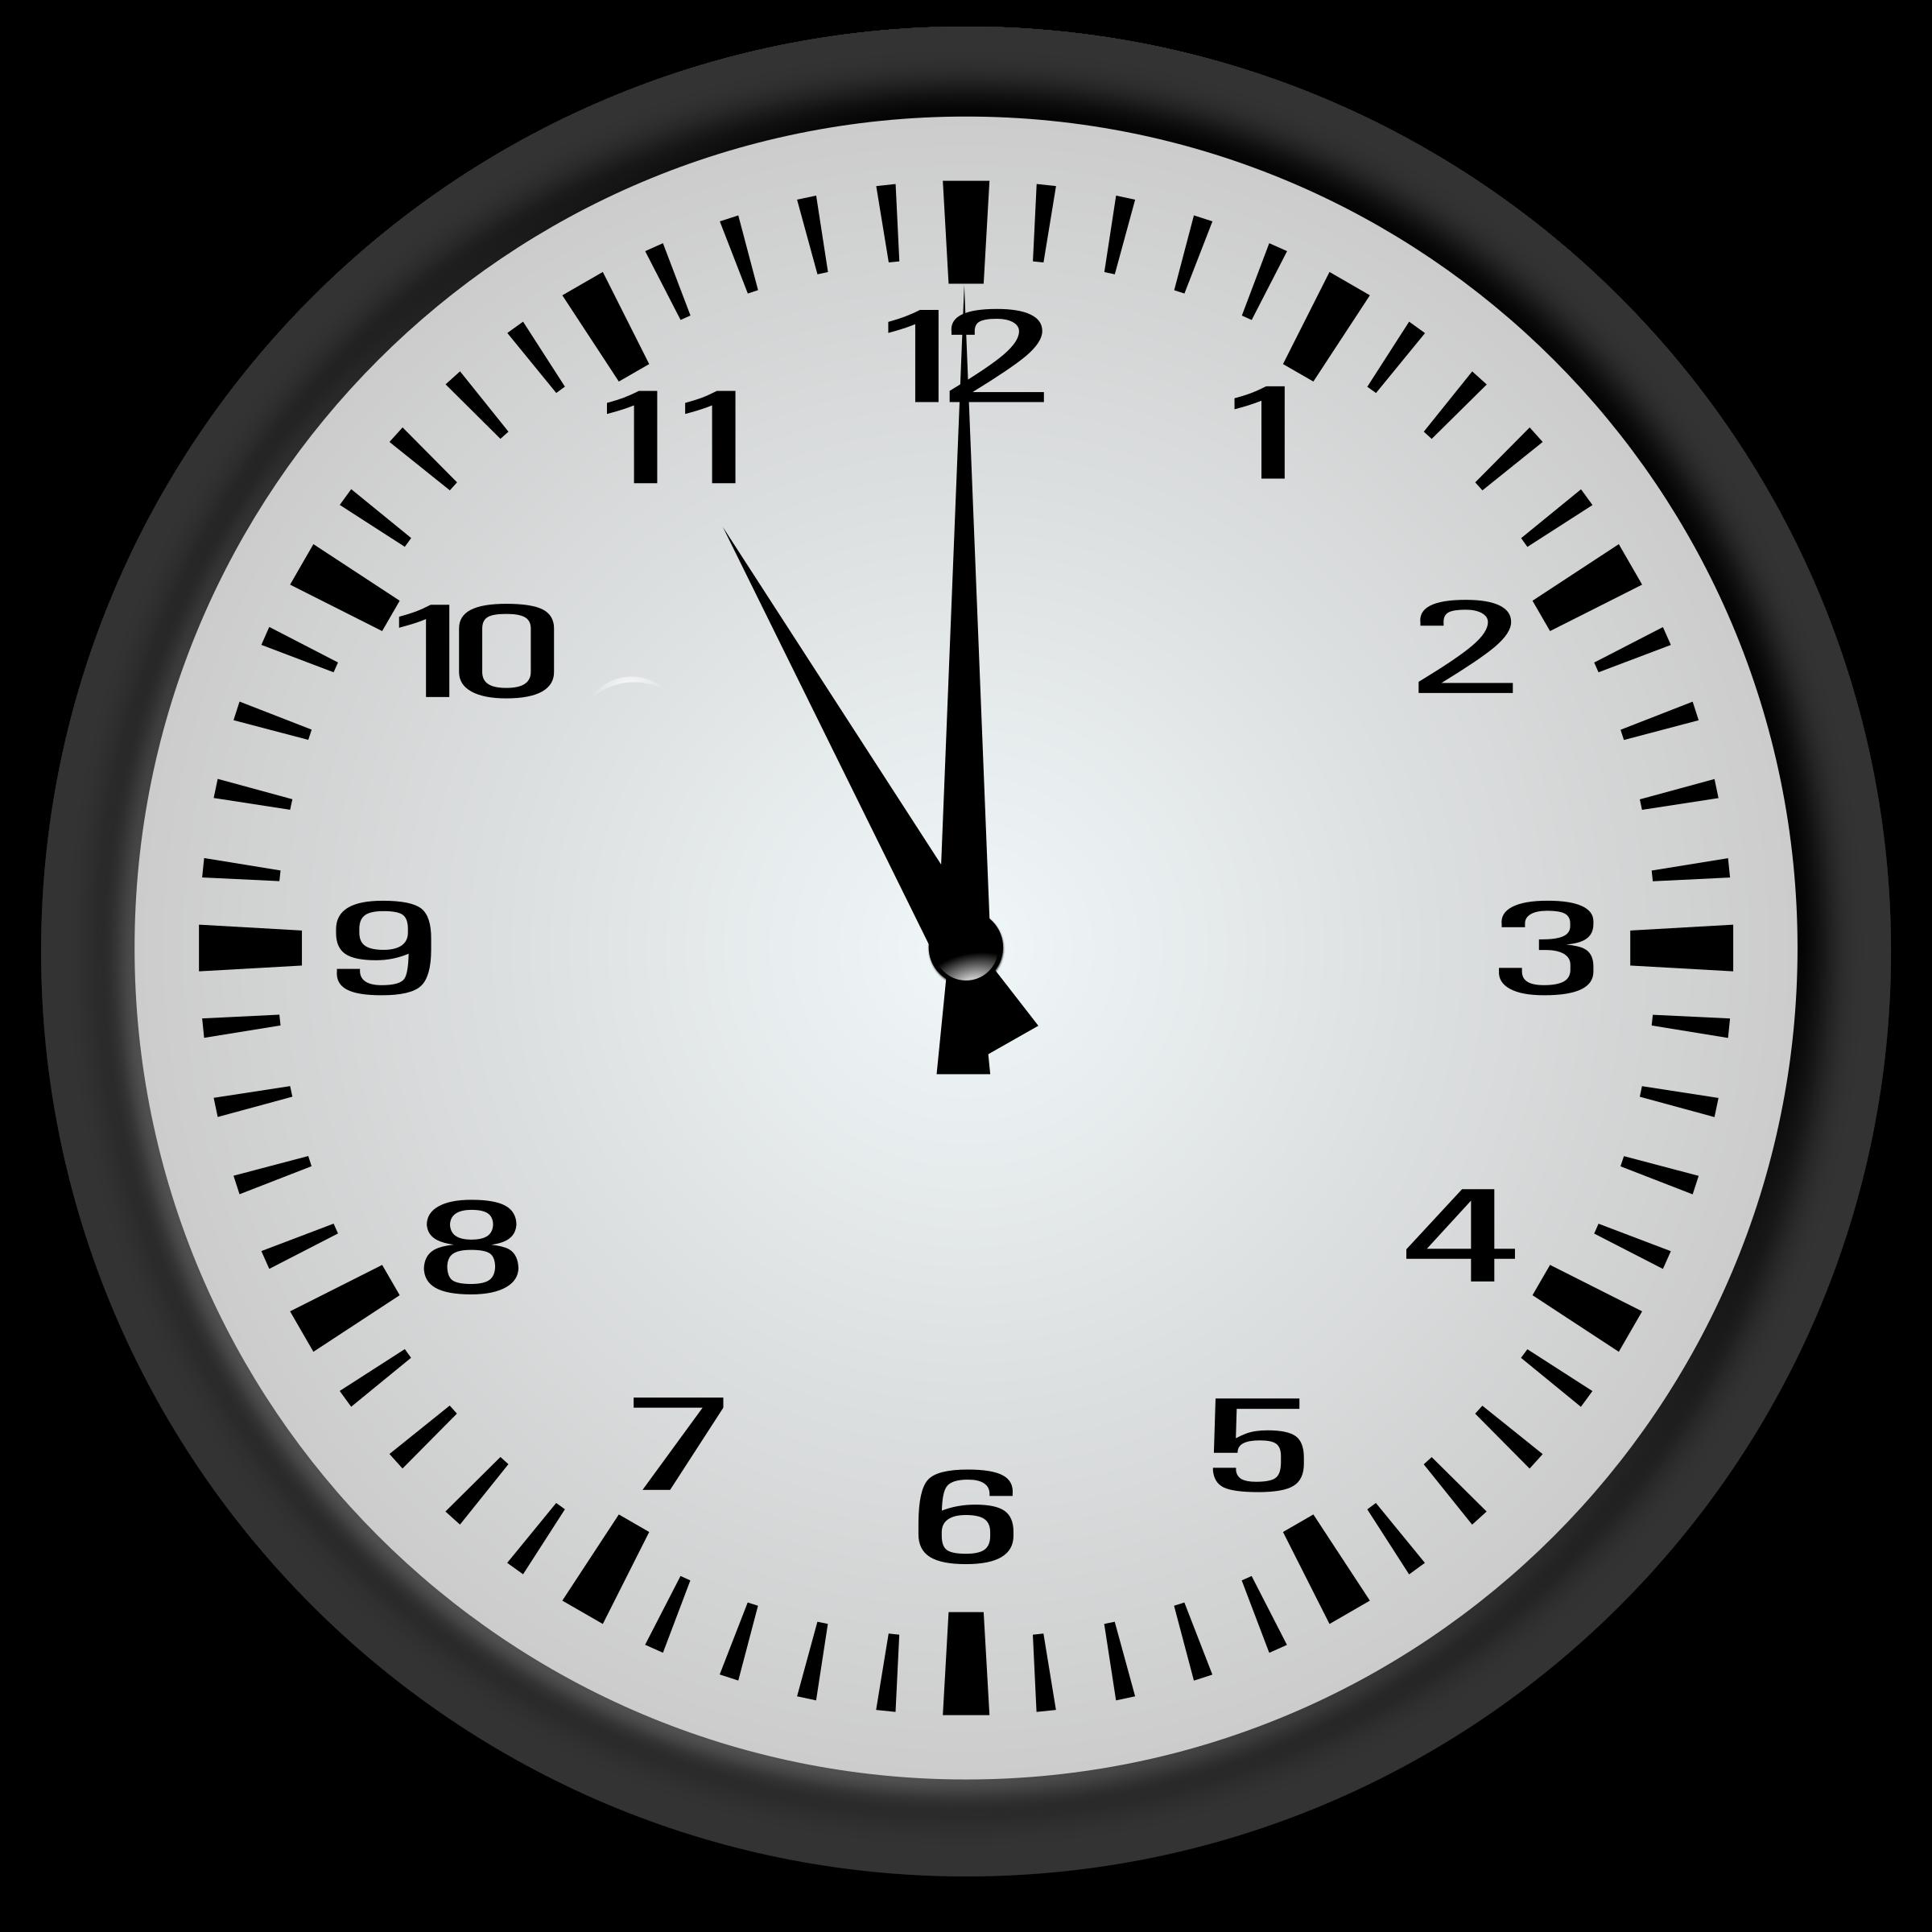 11 o'clock, tick tock